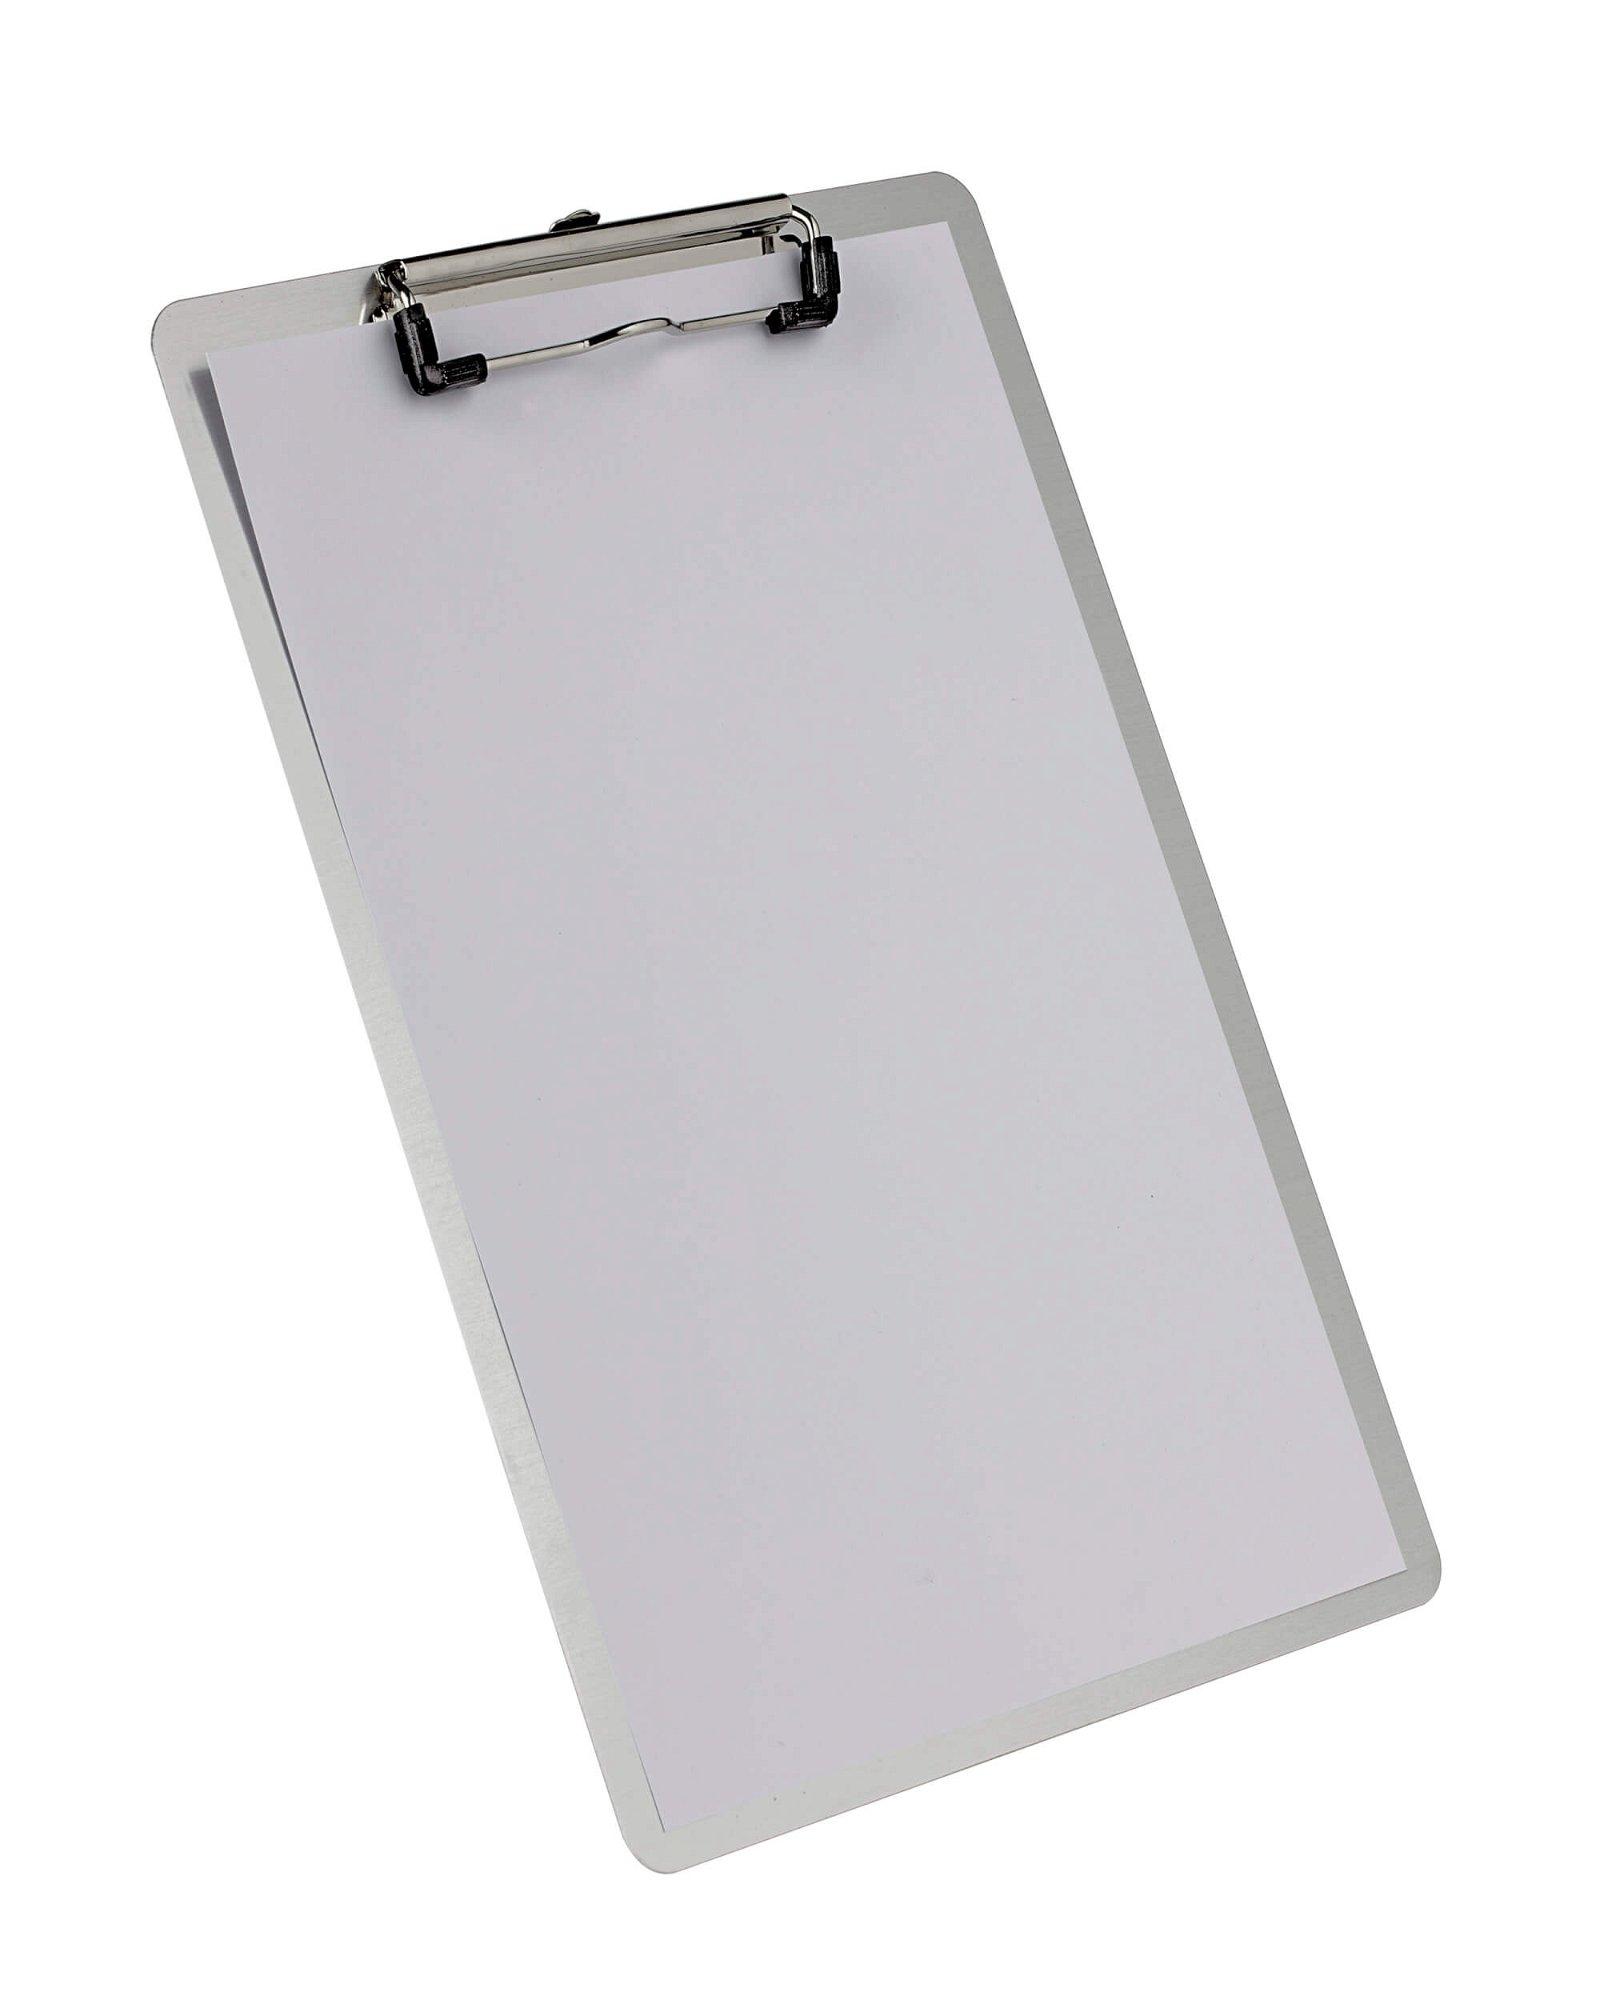 A4 Schreibplatte Aluminium mit Bügelklemme, aluminium